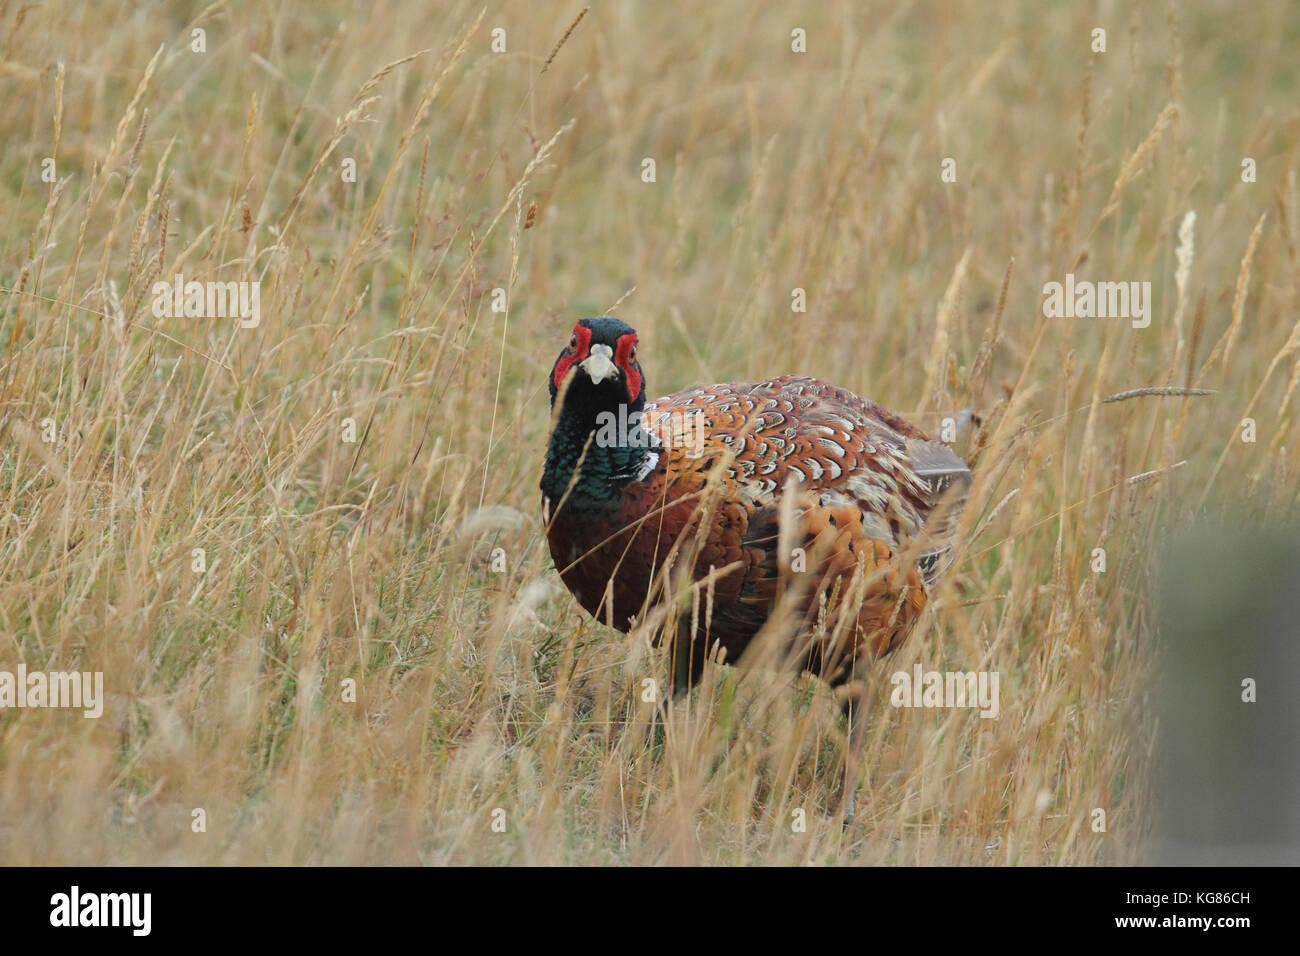 Common pheasant - hunting prey - Stock Image